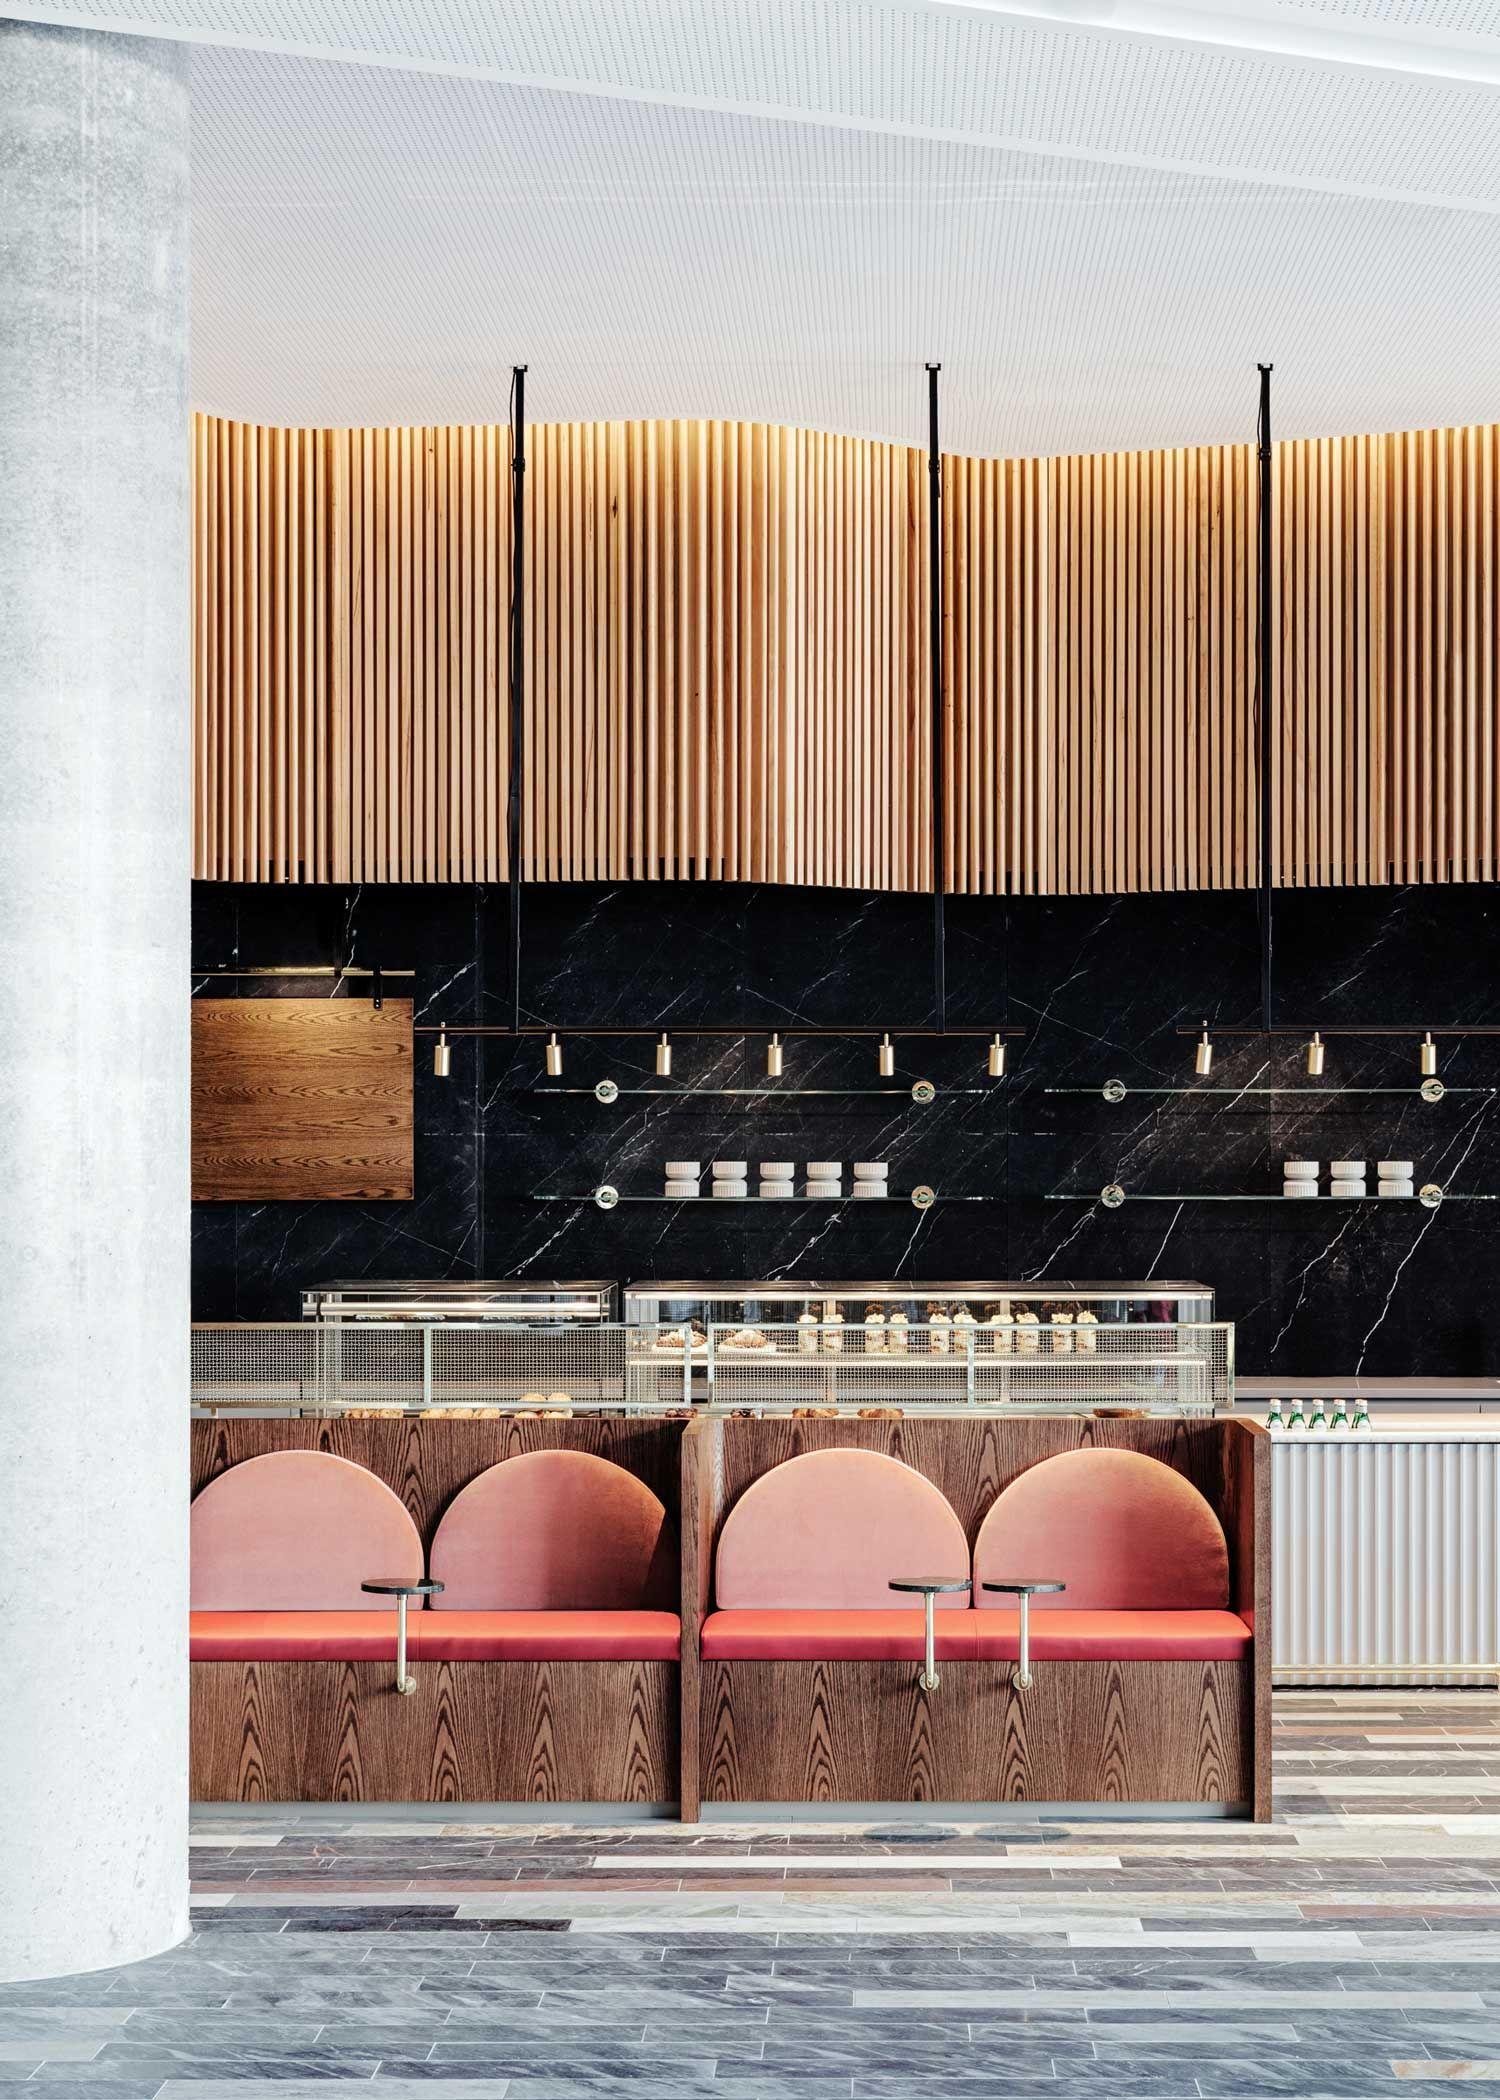 Inserted Into The Ground Floor Of The New Commonwealth Bank Office Building Studio Tate Has Designed Cafe Design Restaurant Interior Design Restaurant Design